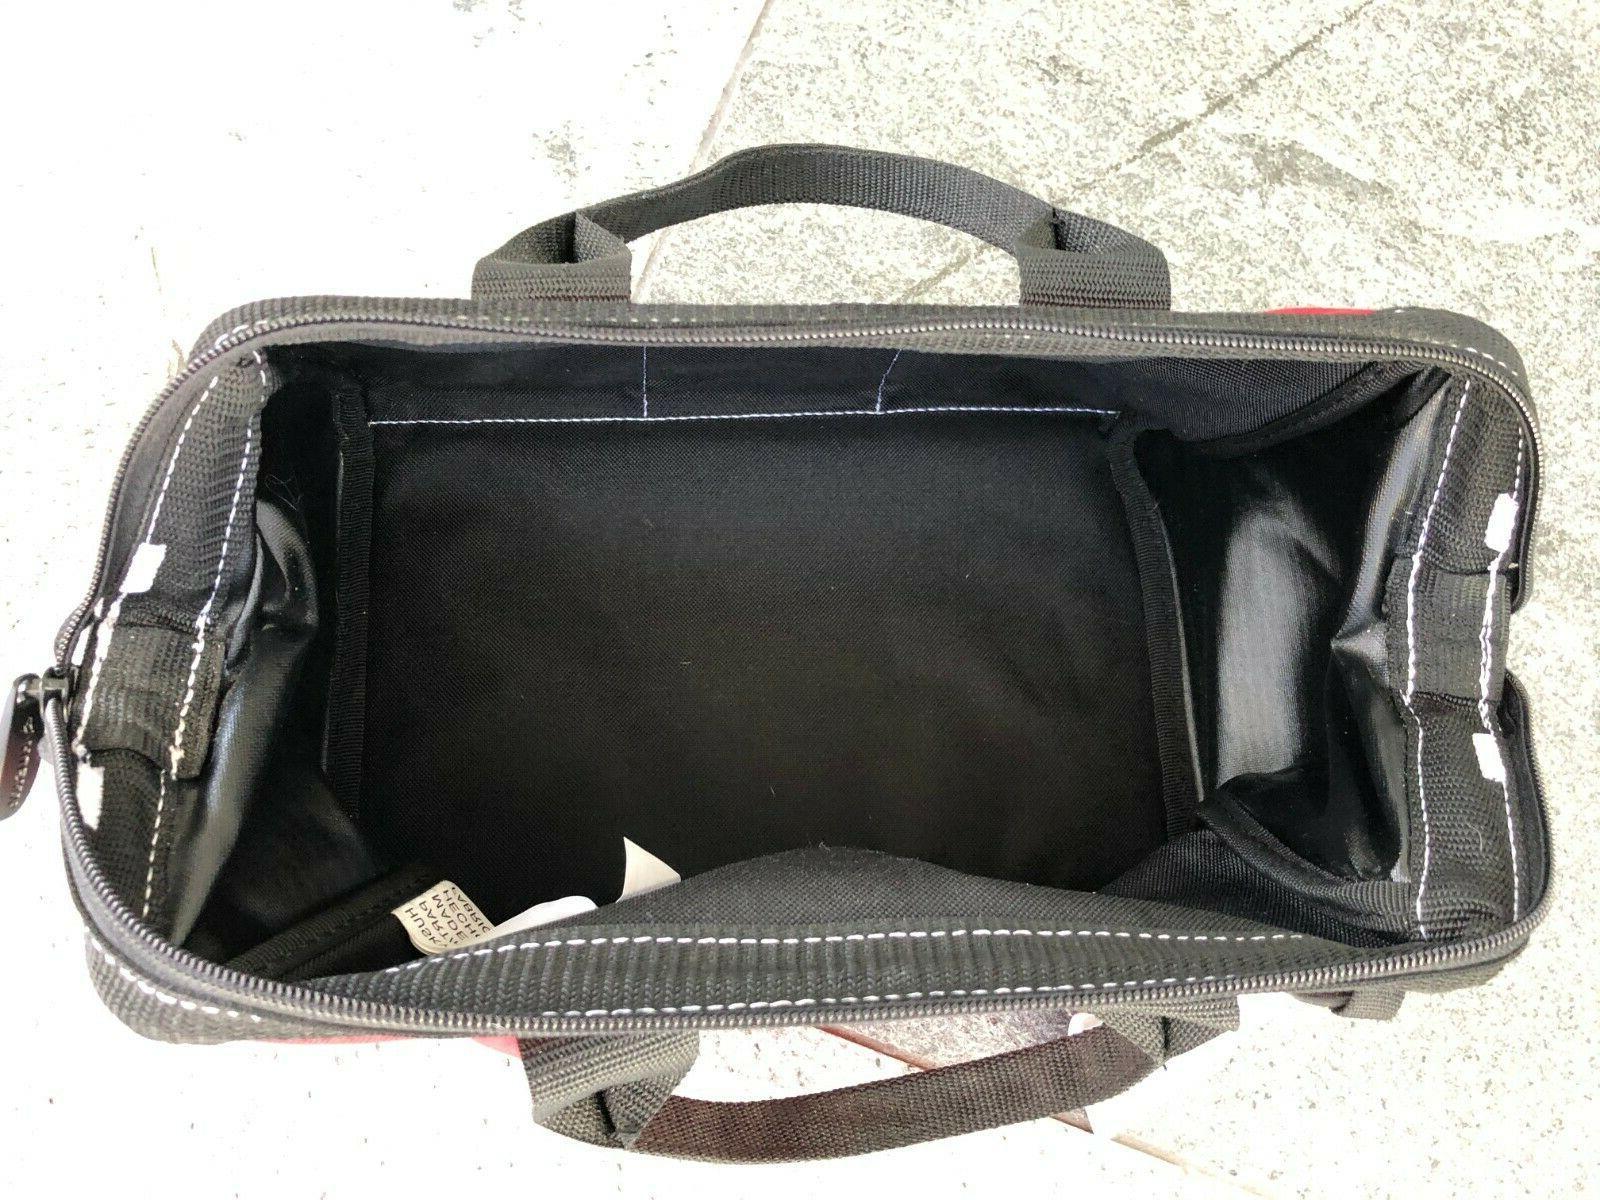 Husky Bag Storage Resistant